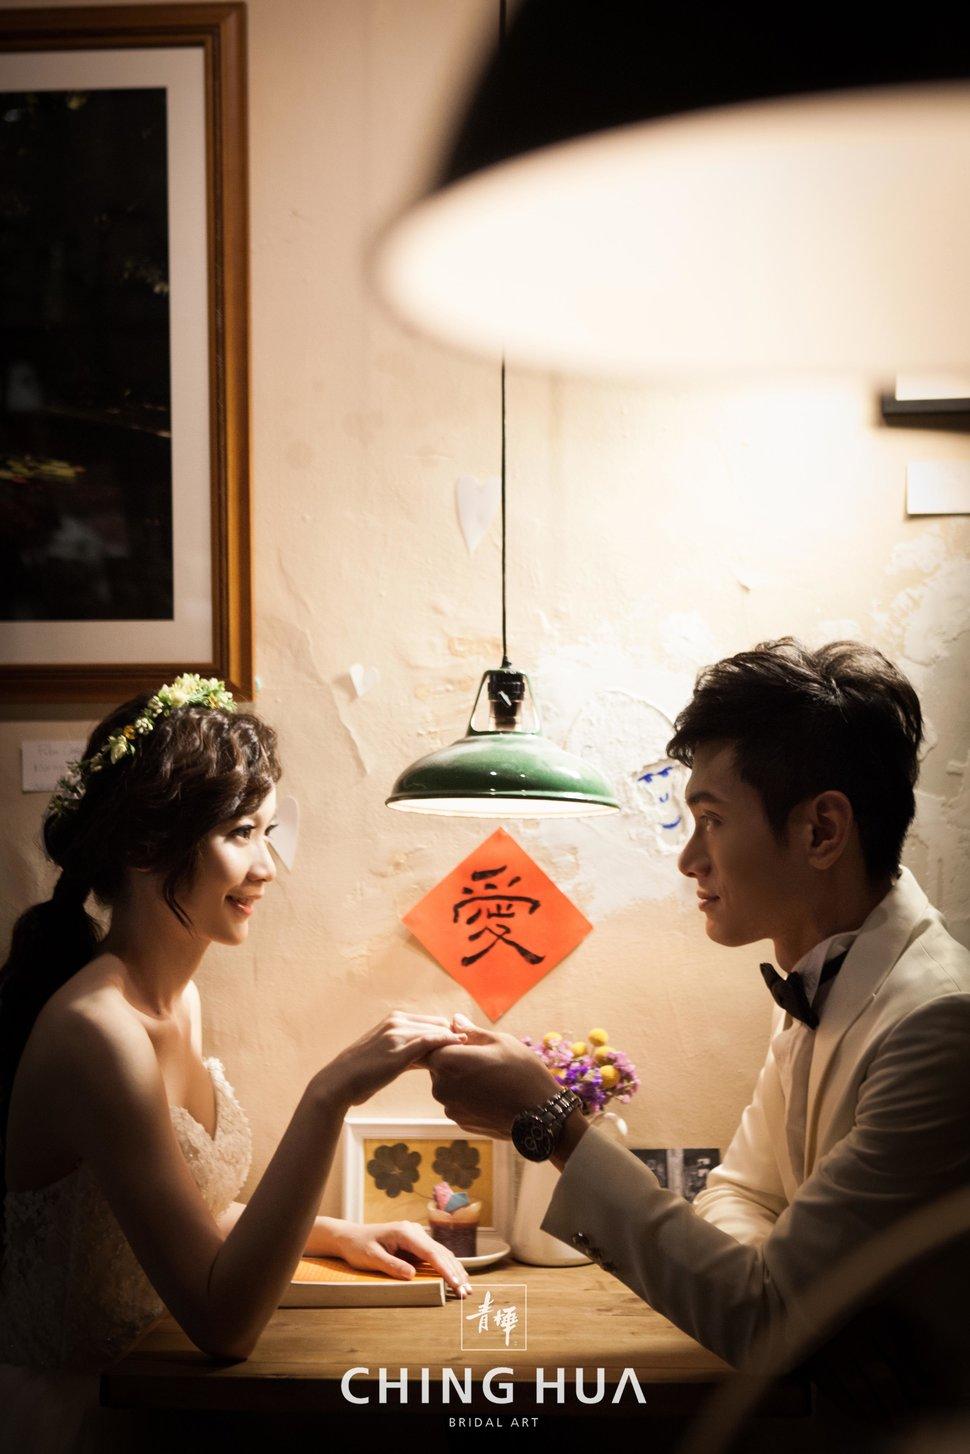 (編號:193273) - 青樺婚紗CHINGHUA - 結婚吧